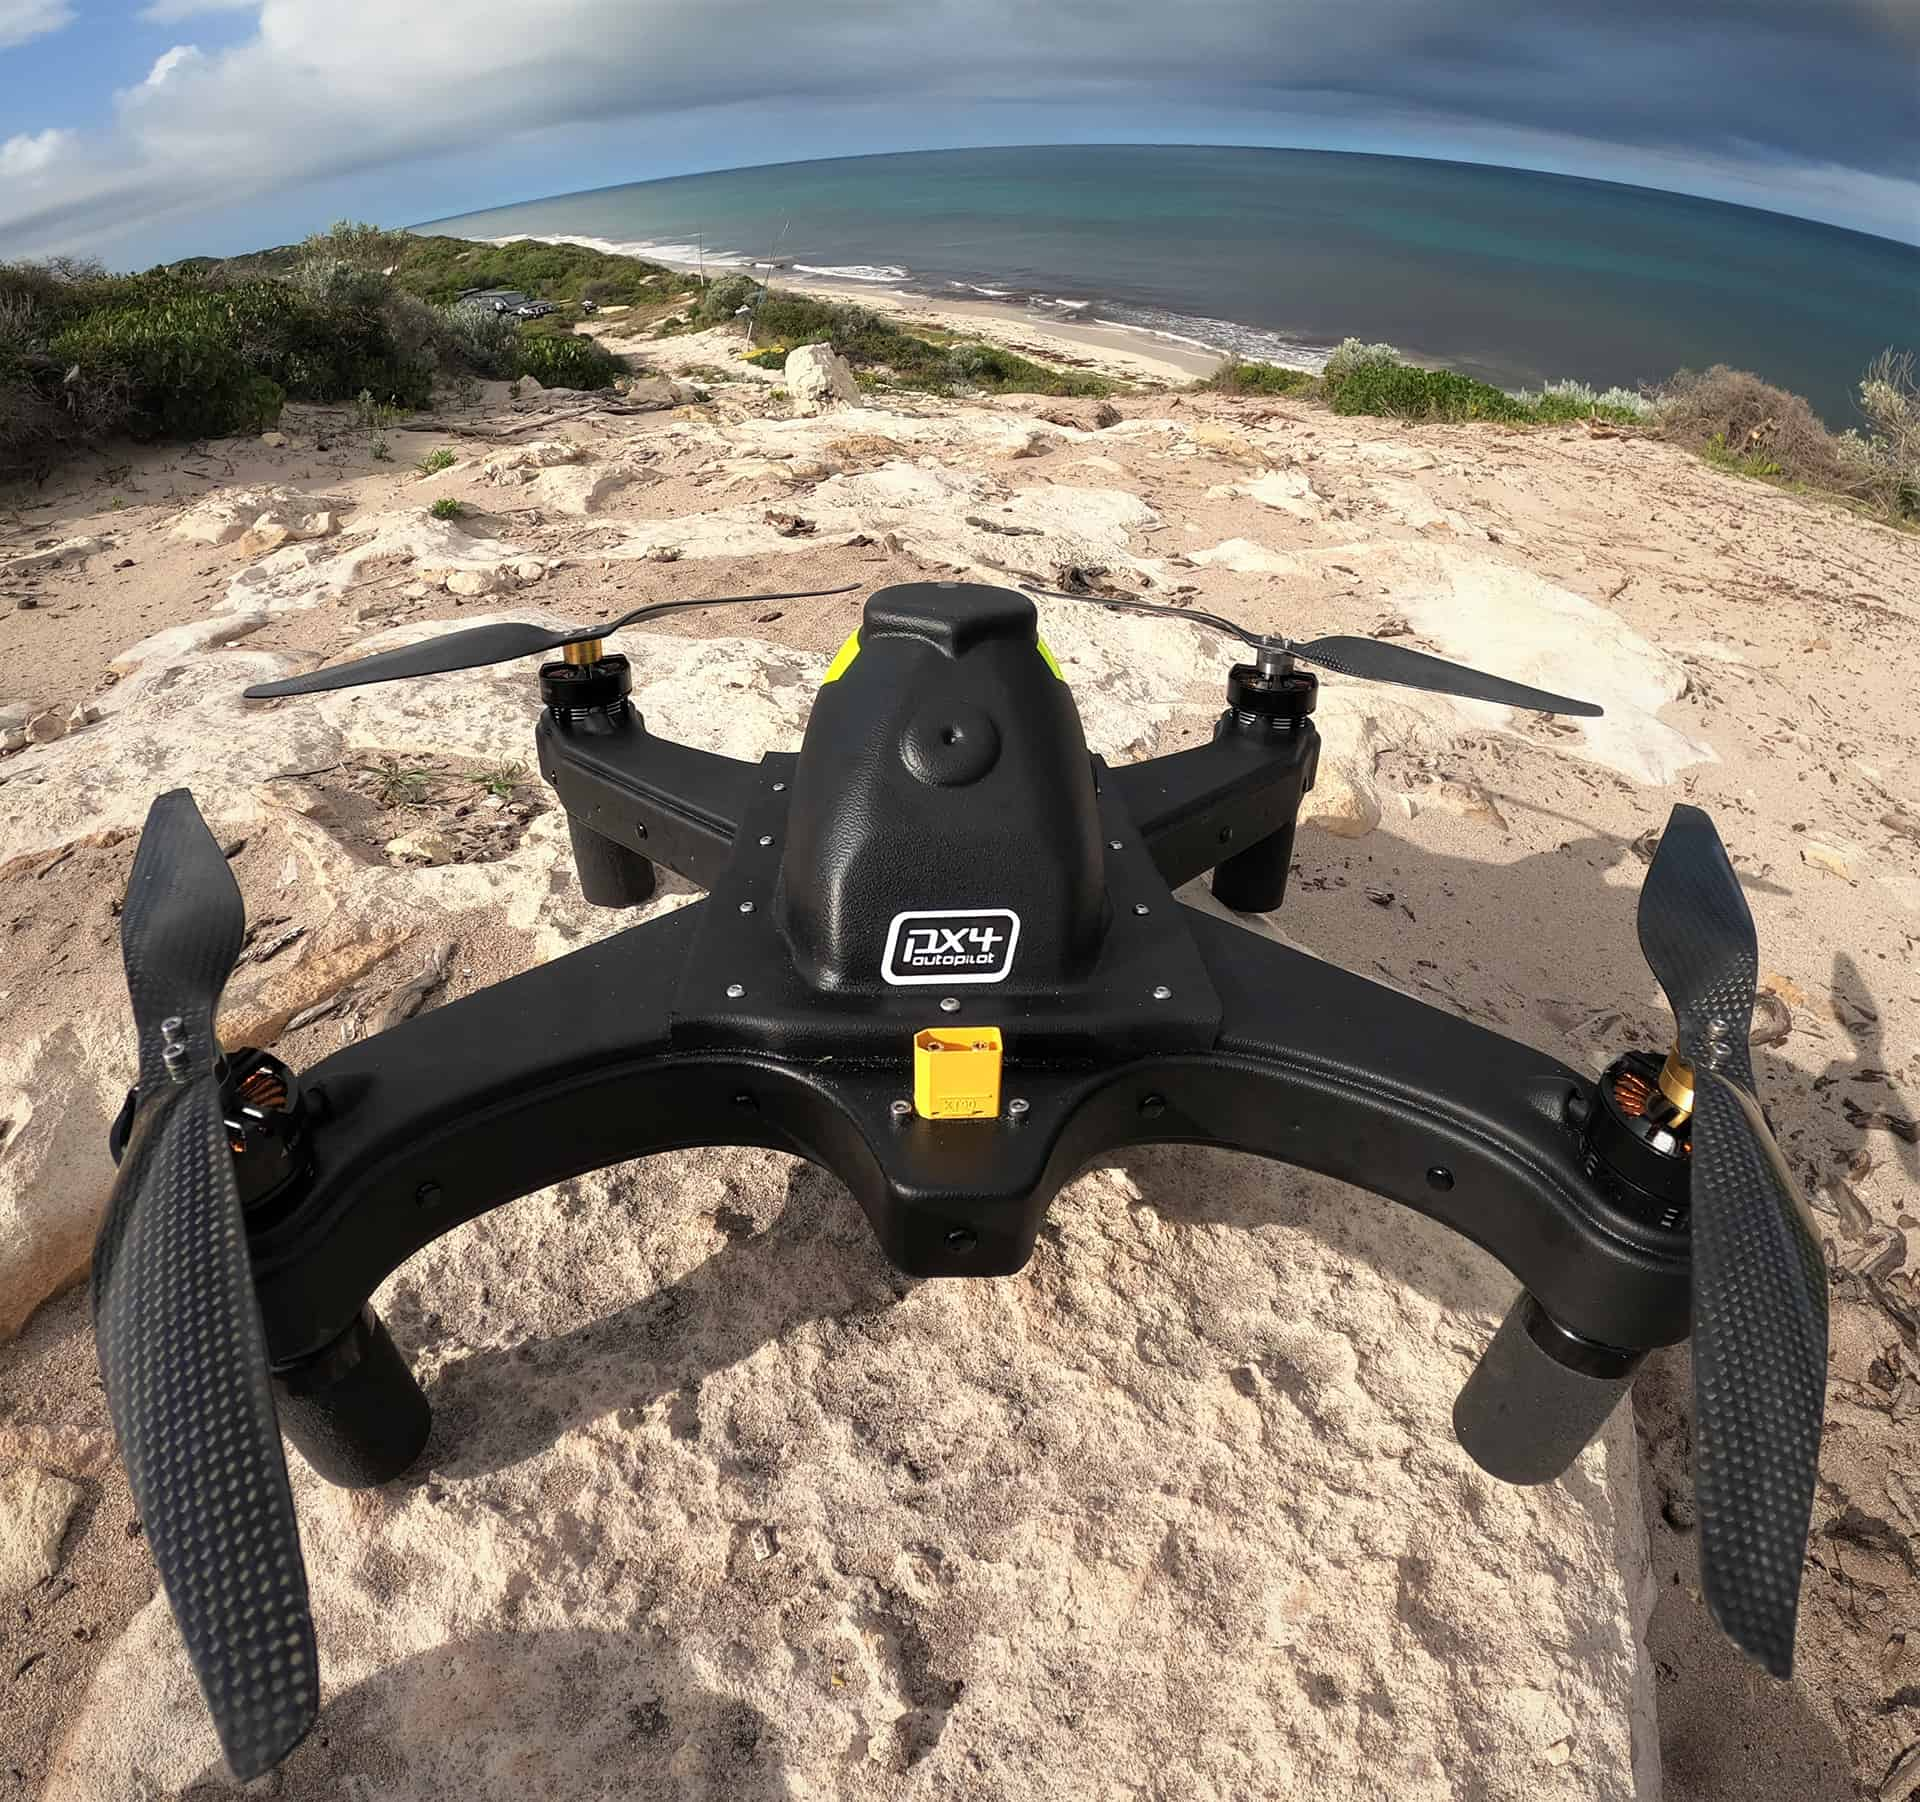 Cuta-Copter Waterproof Drone